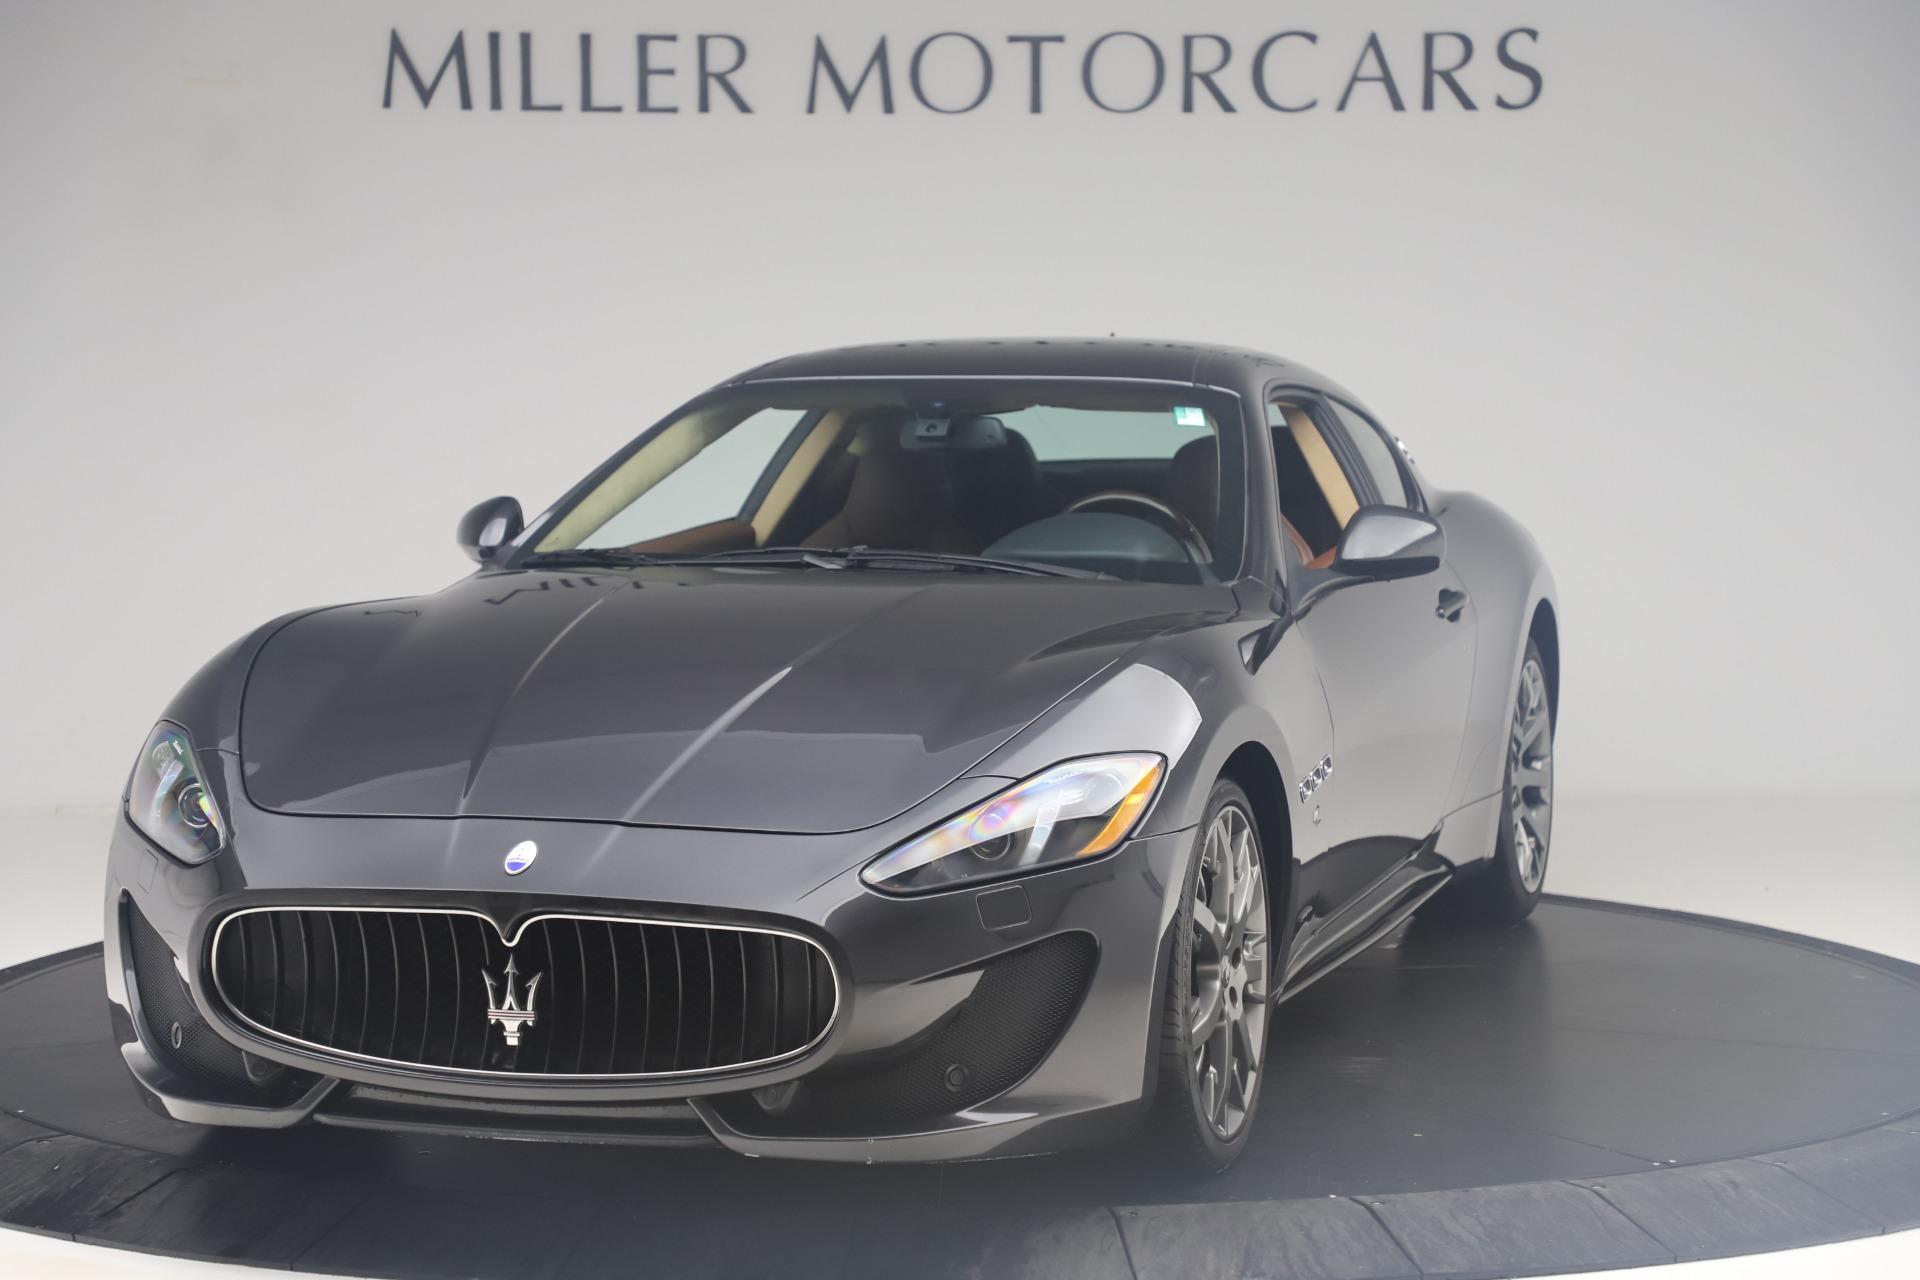 Used 2016 Maserati GranTurismo Sport for sale $64,900 at Maserati of Westport in Westport CT 06880 1